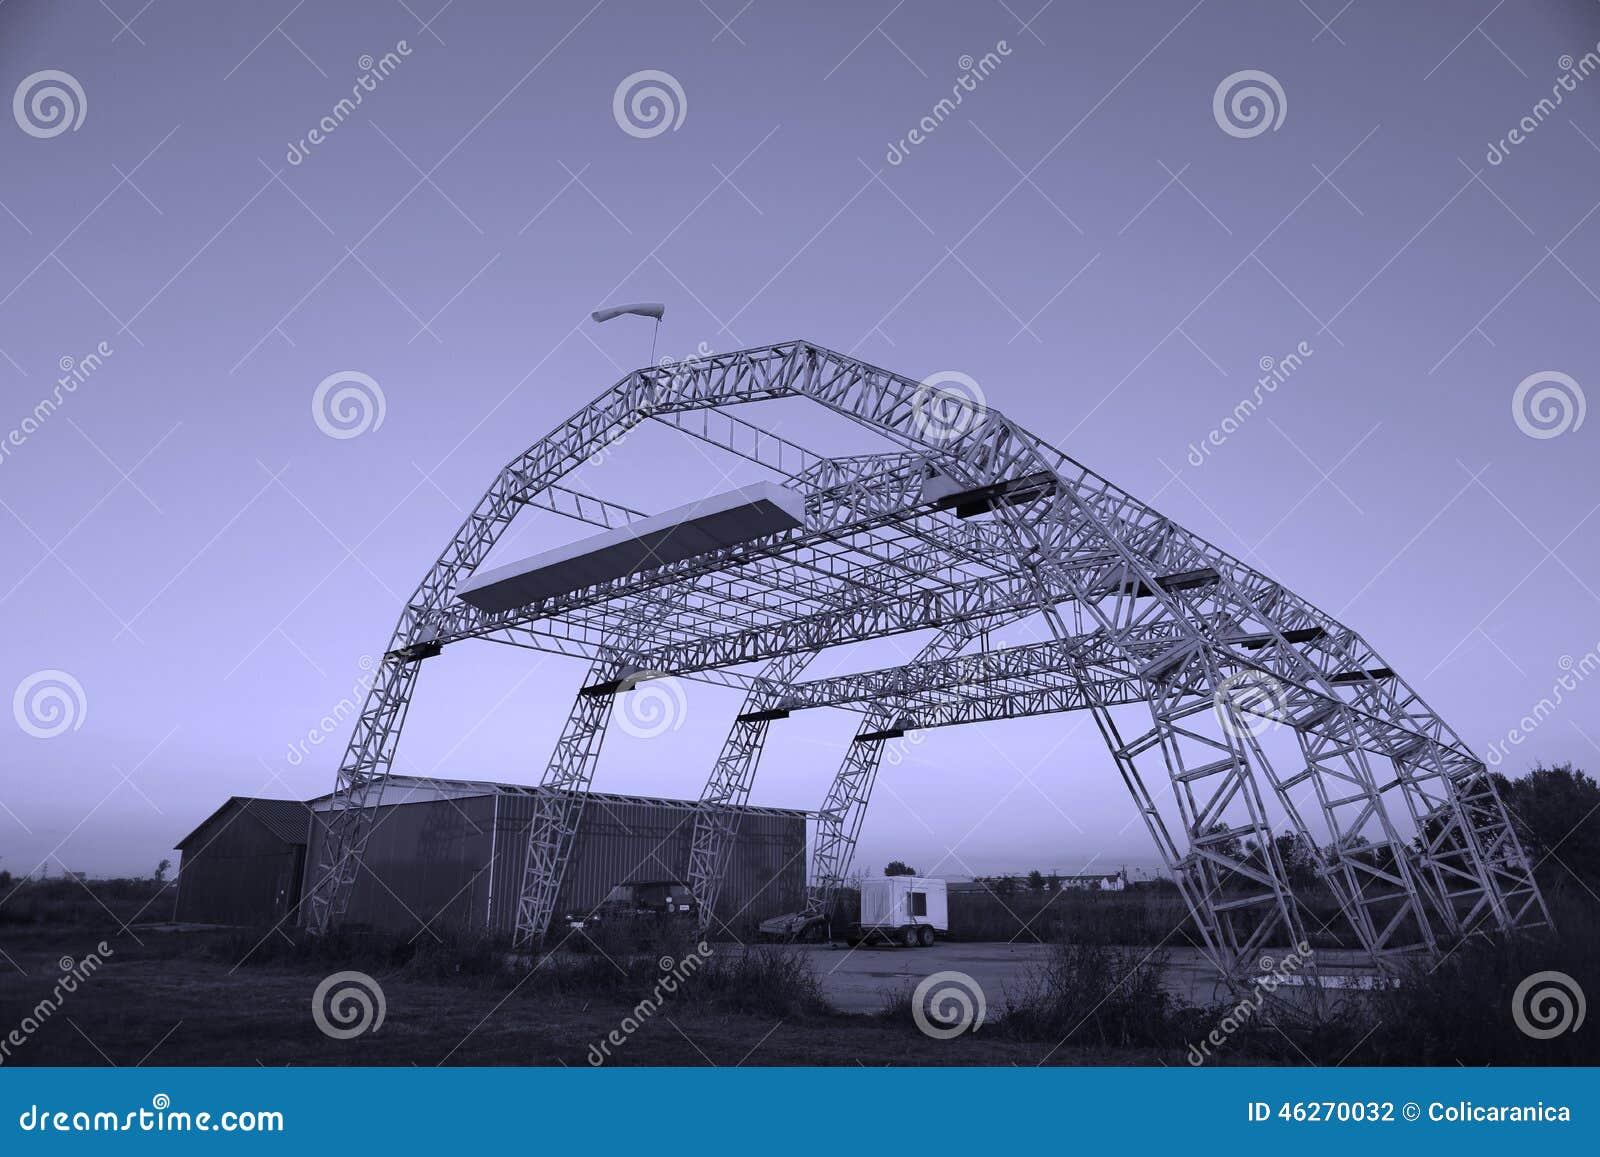 Hangar for planes